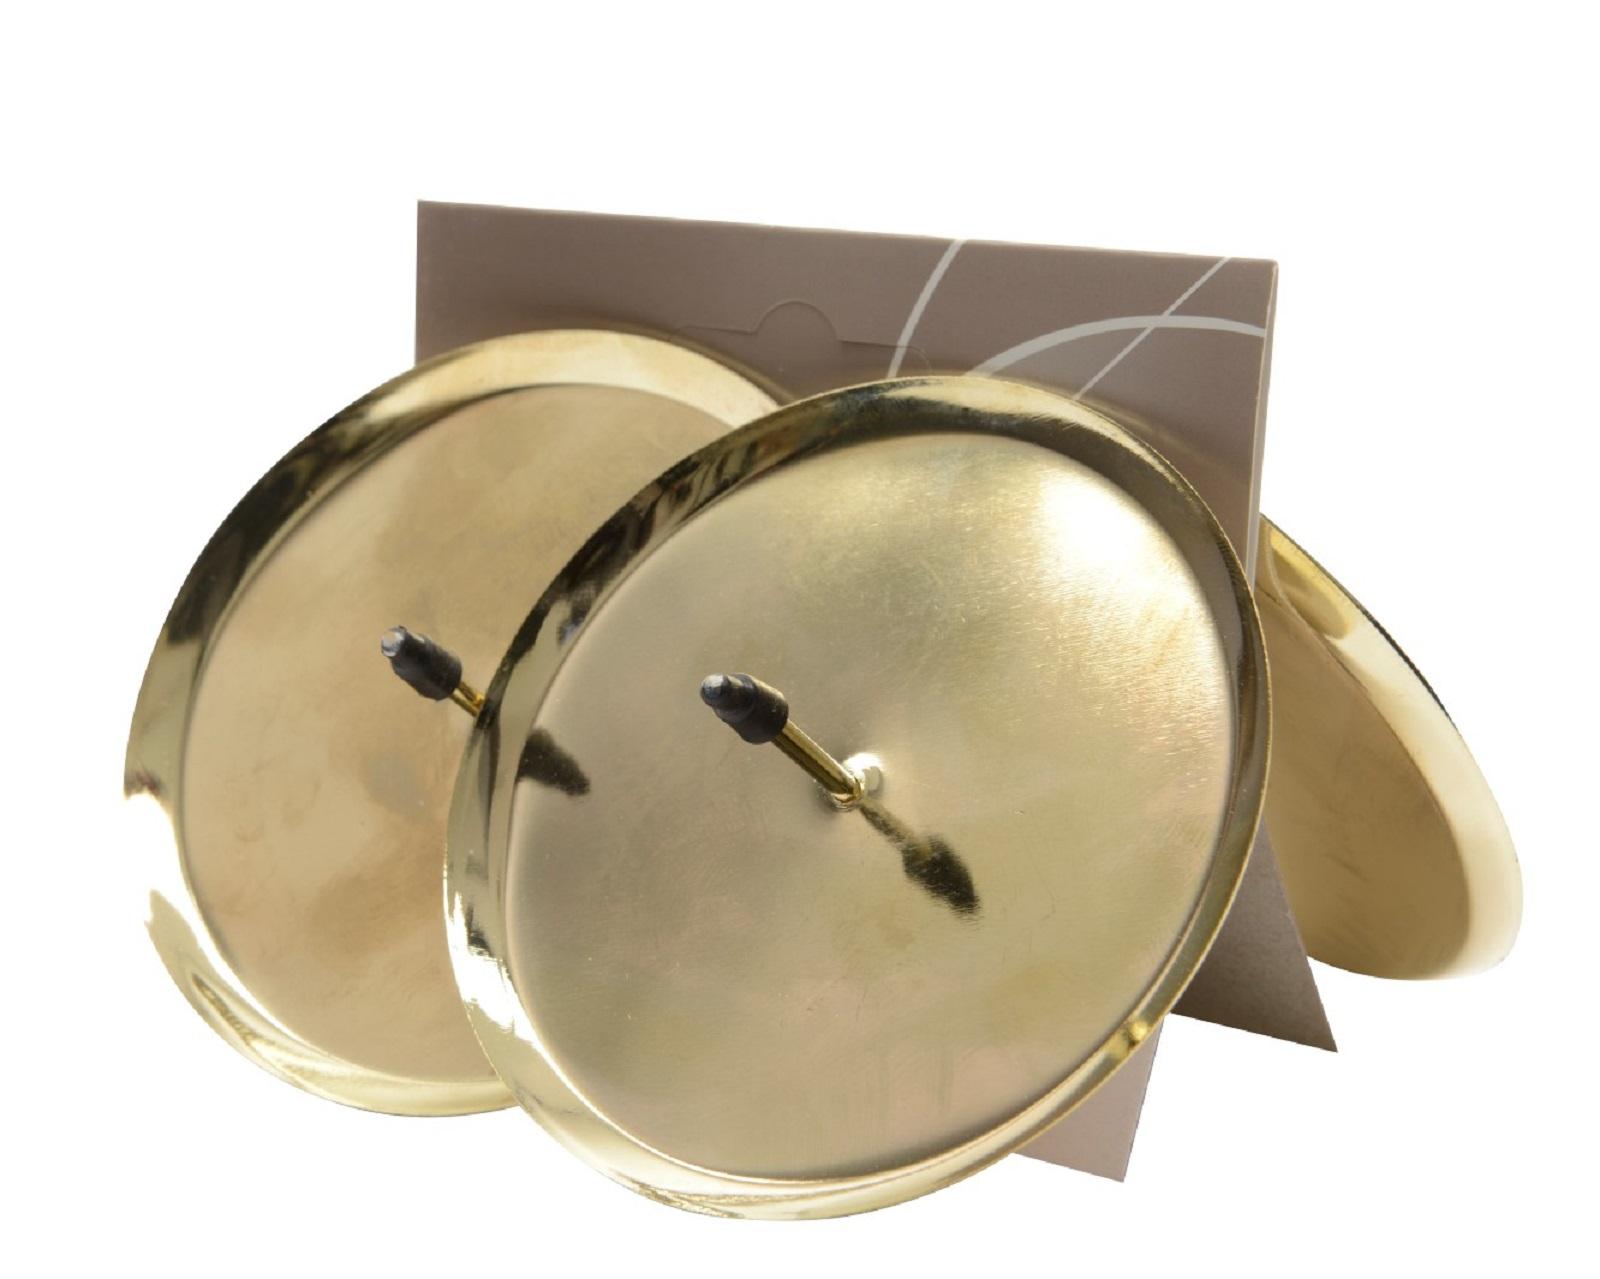 4 Stück Adventskerzenhalter 8cm gold Kerzenhalter Advent Kerzen Adventskranz